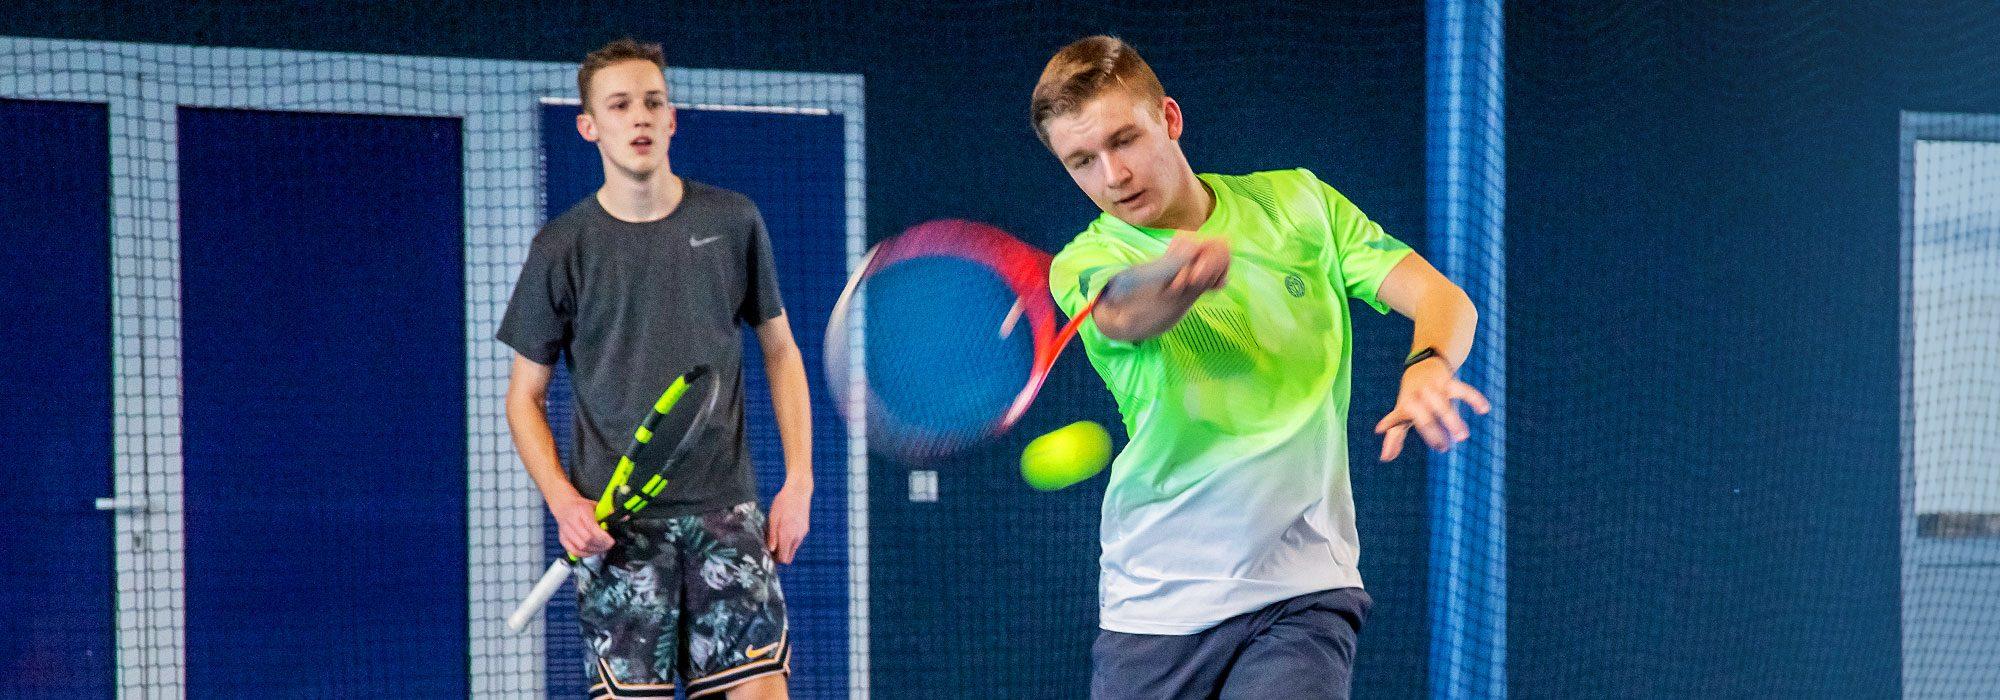 Impressum | Tennisschule Knogler